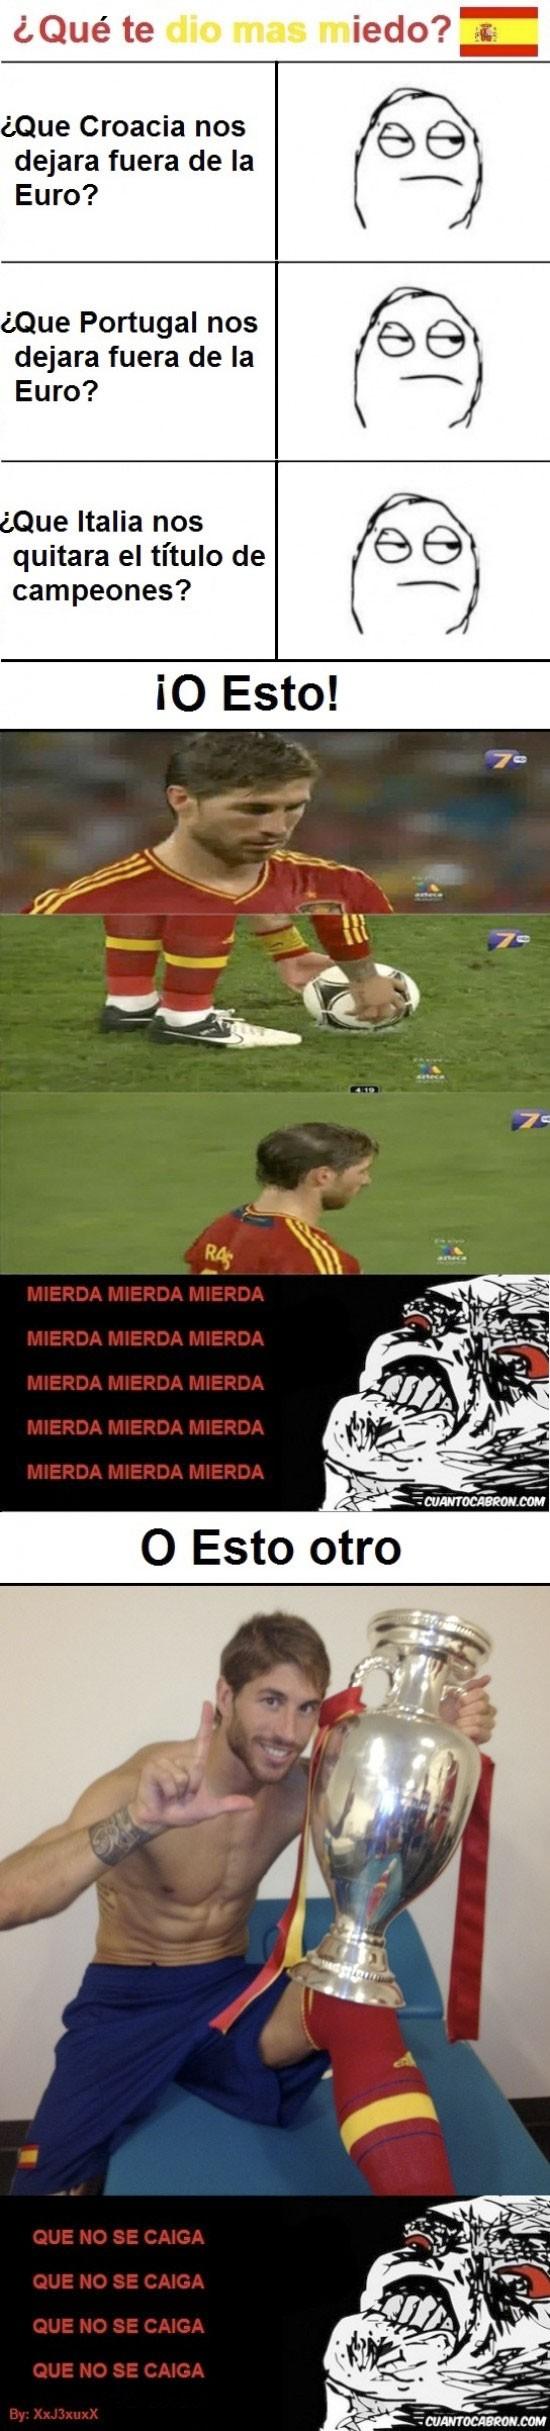 eurocopa,penalti,Sergio Ramos,trofeo